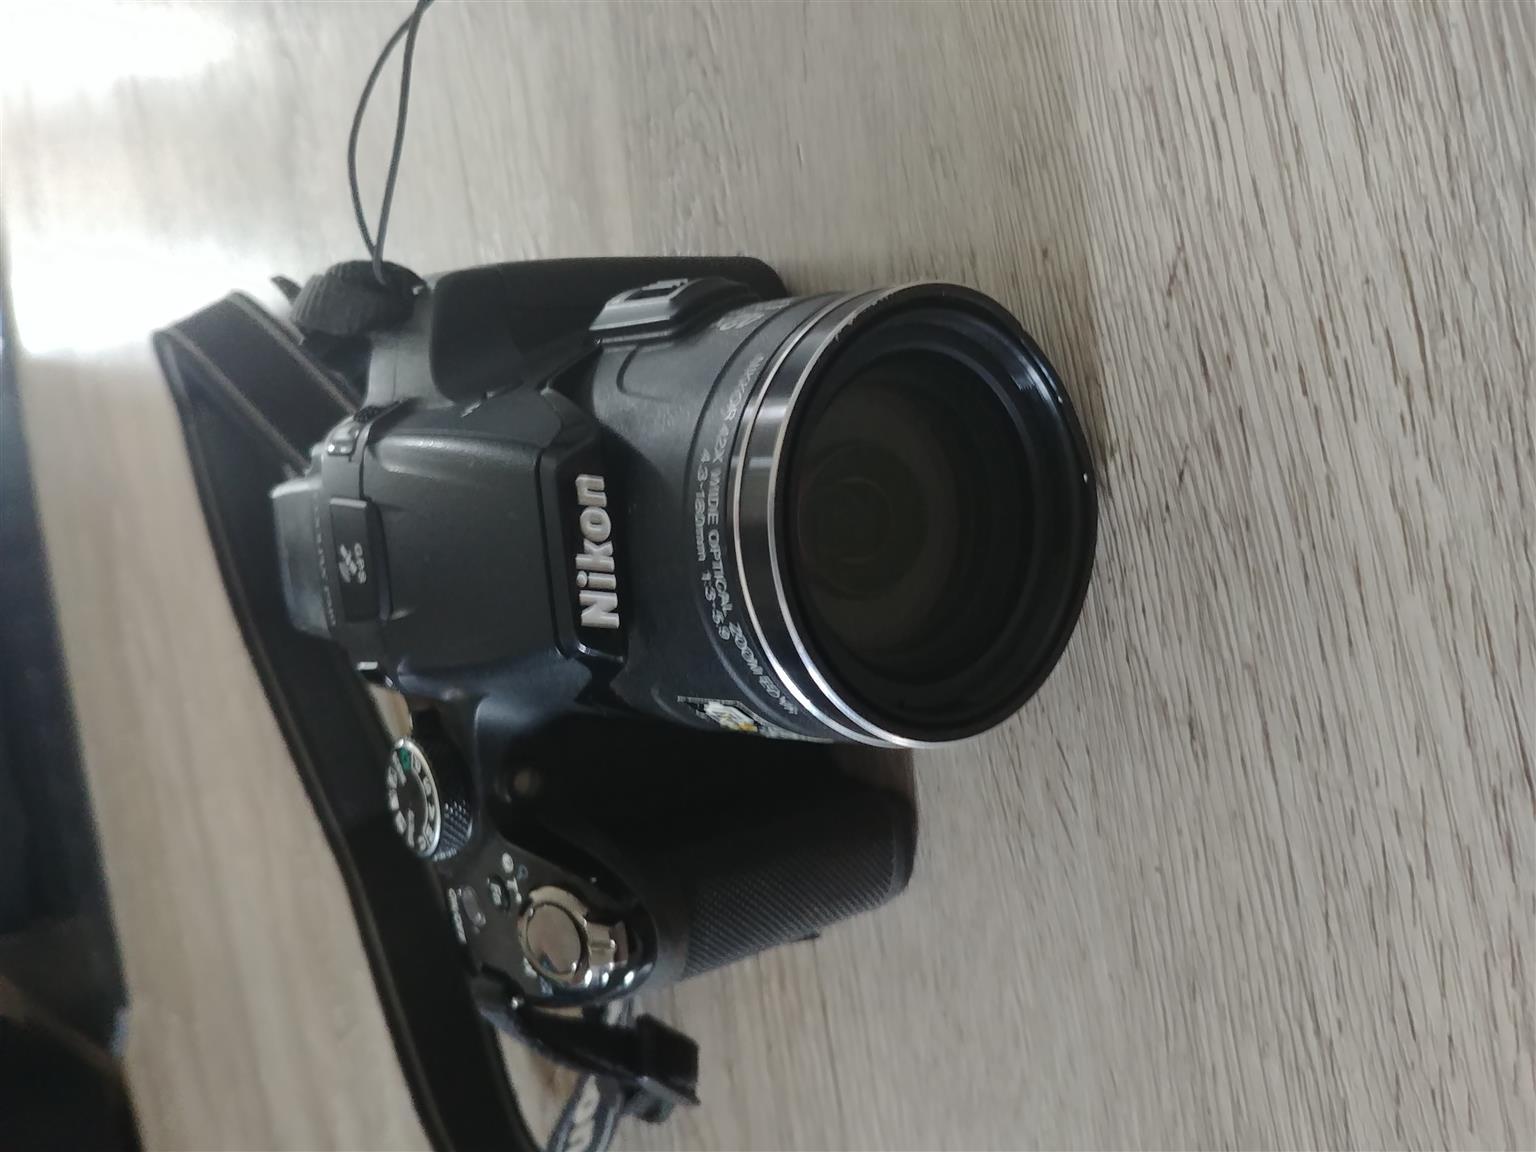 Nikon CoolPix 510